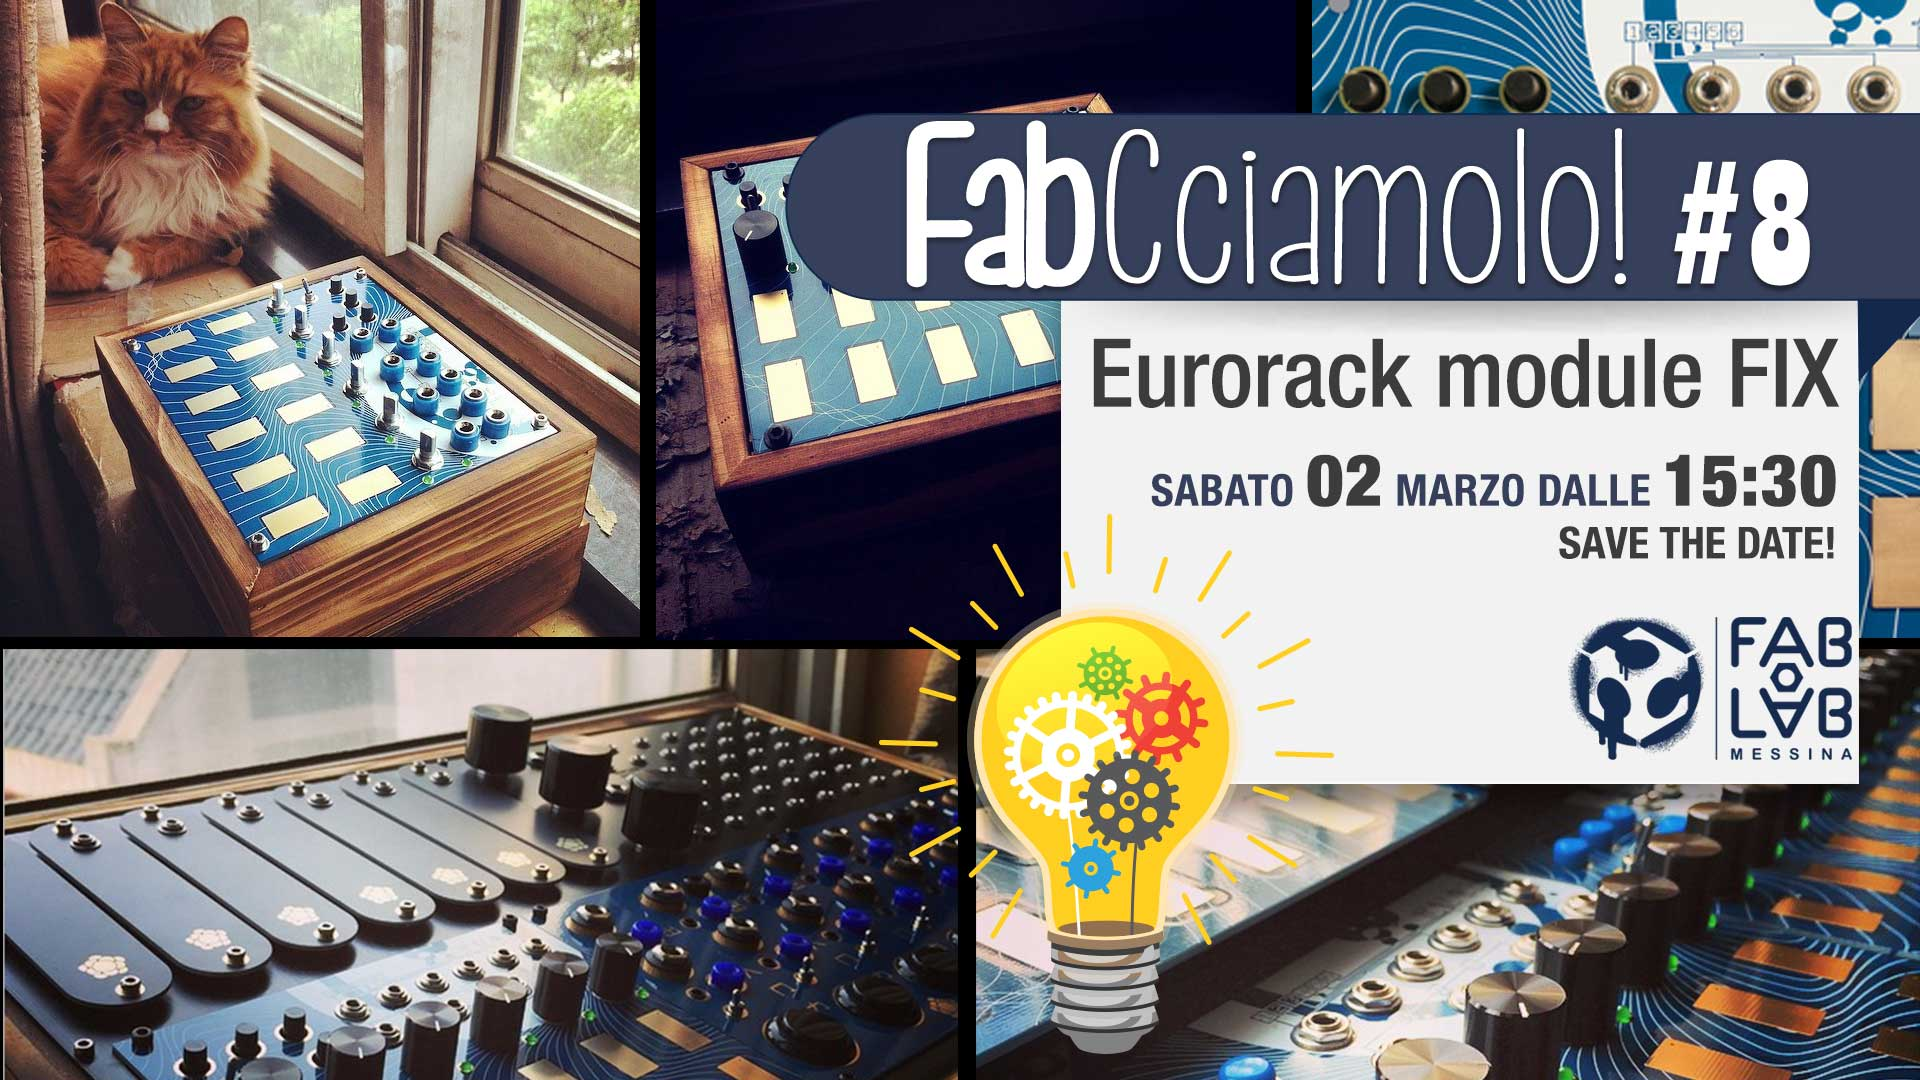 FabCciamolo!#8 Eurorack module FIX